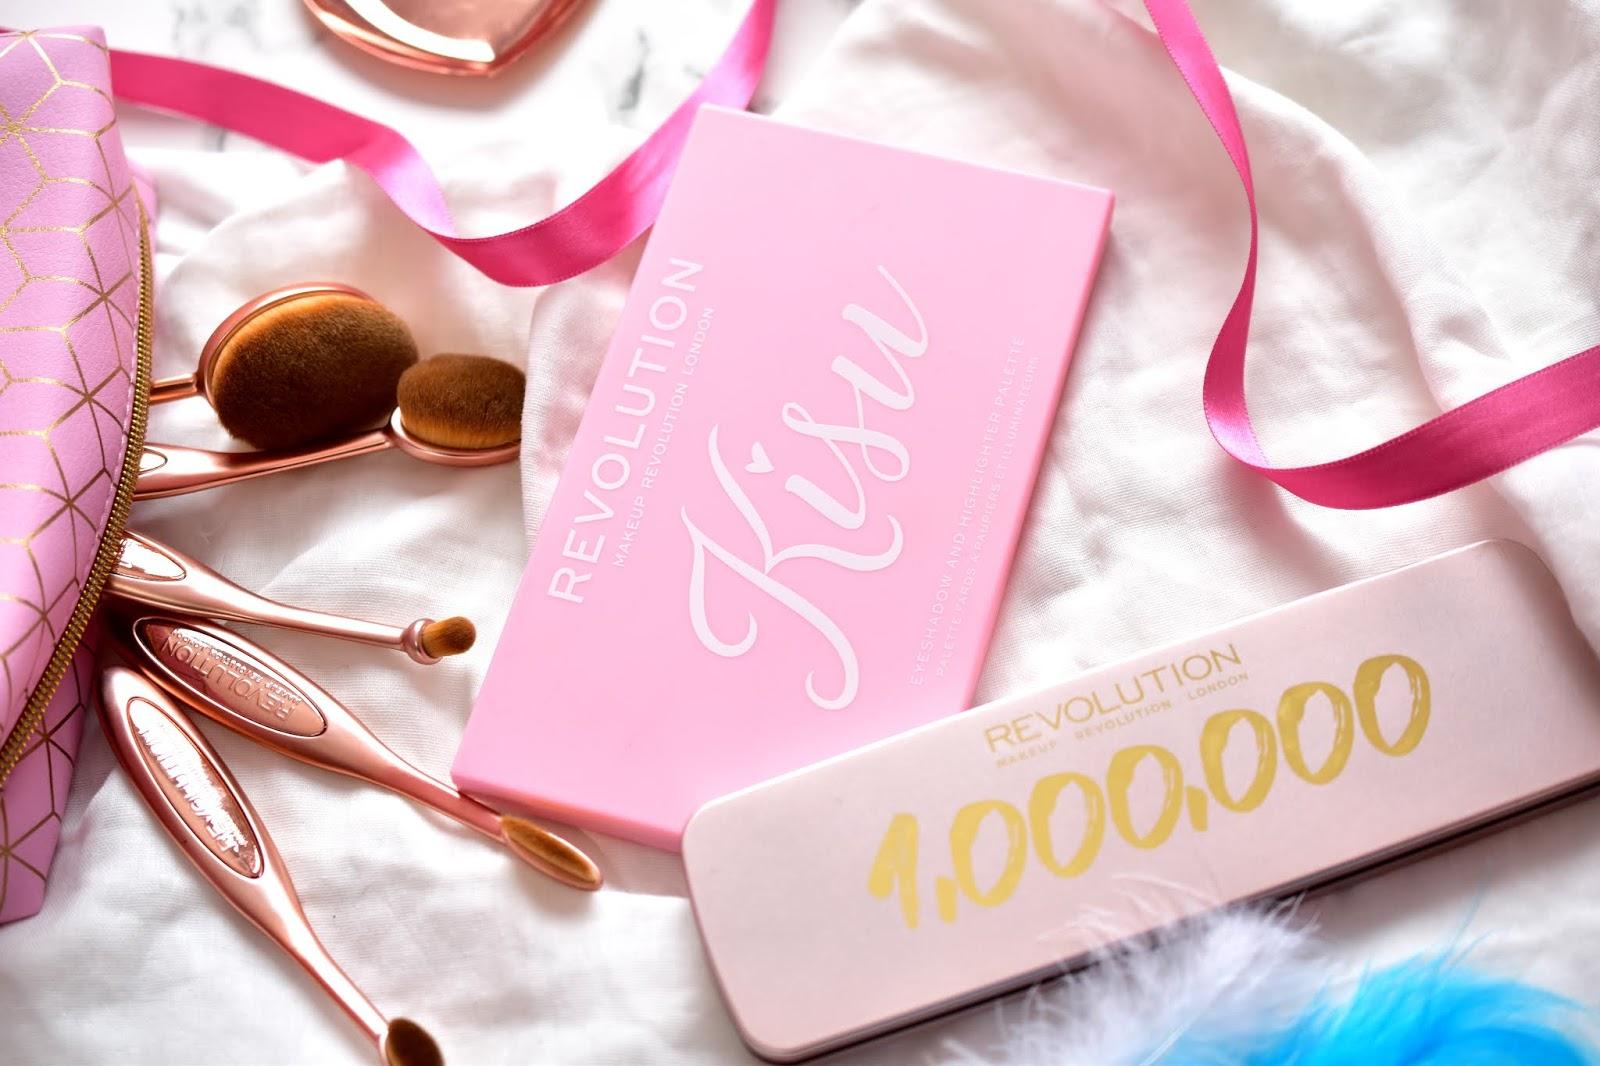 Paletky makeup revolution